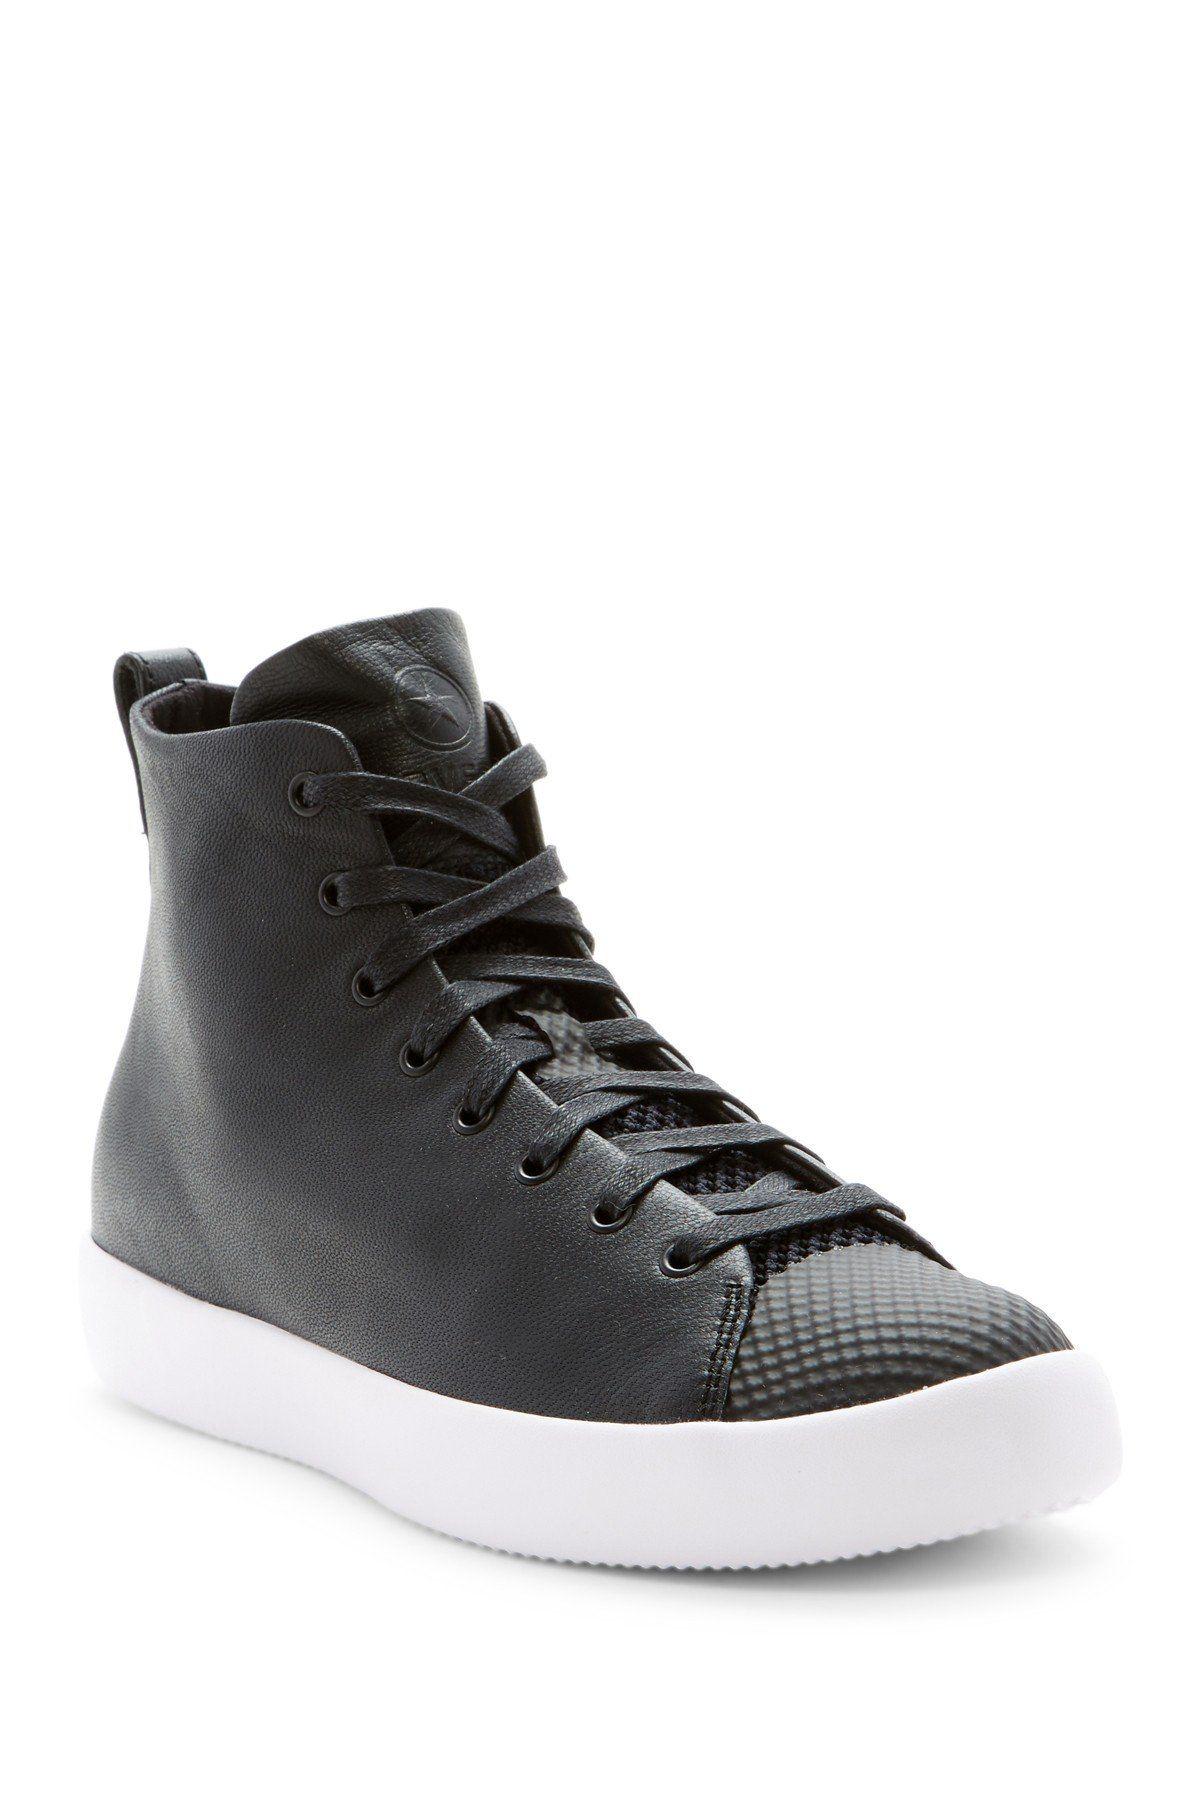 84b19ab24614 All Star Modern High Top Sneaker (Unisex)